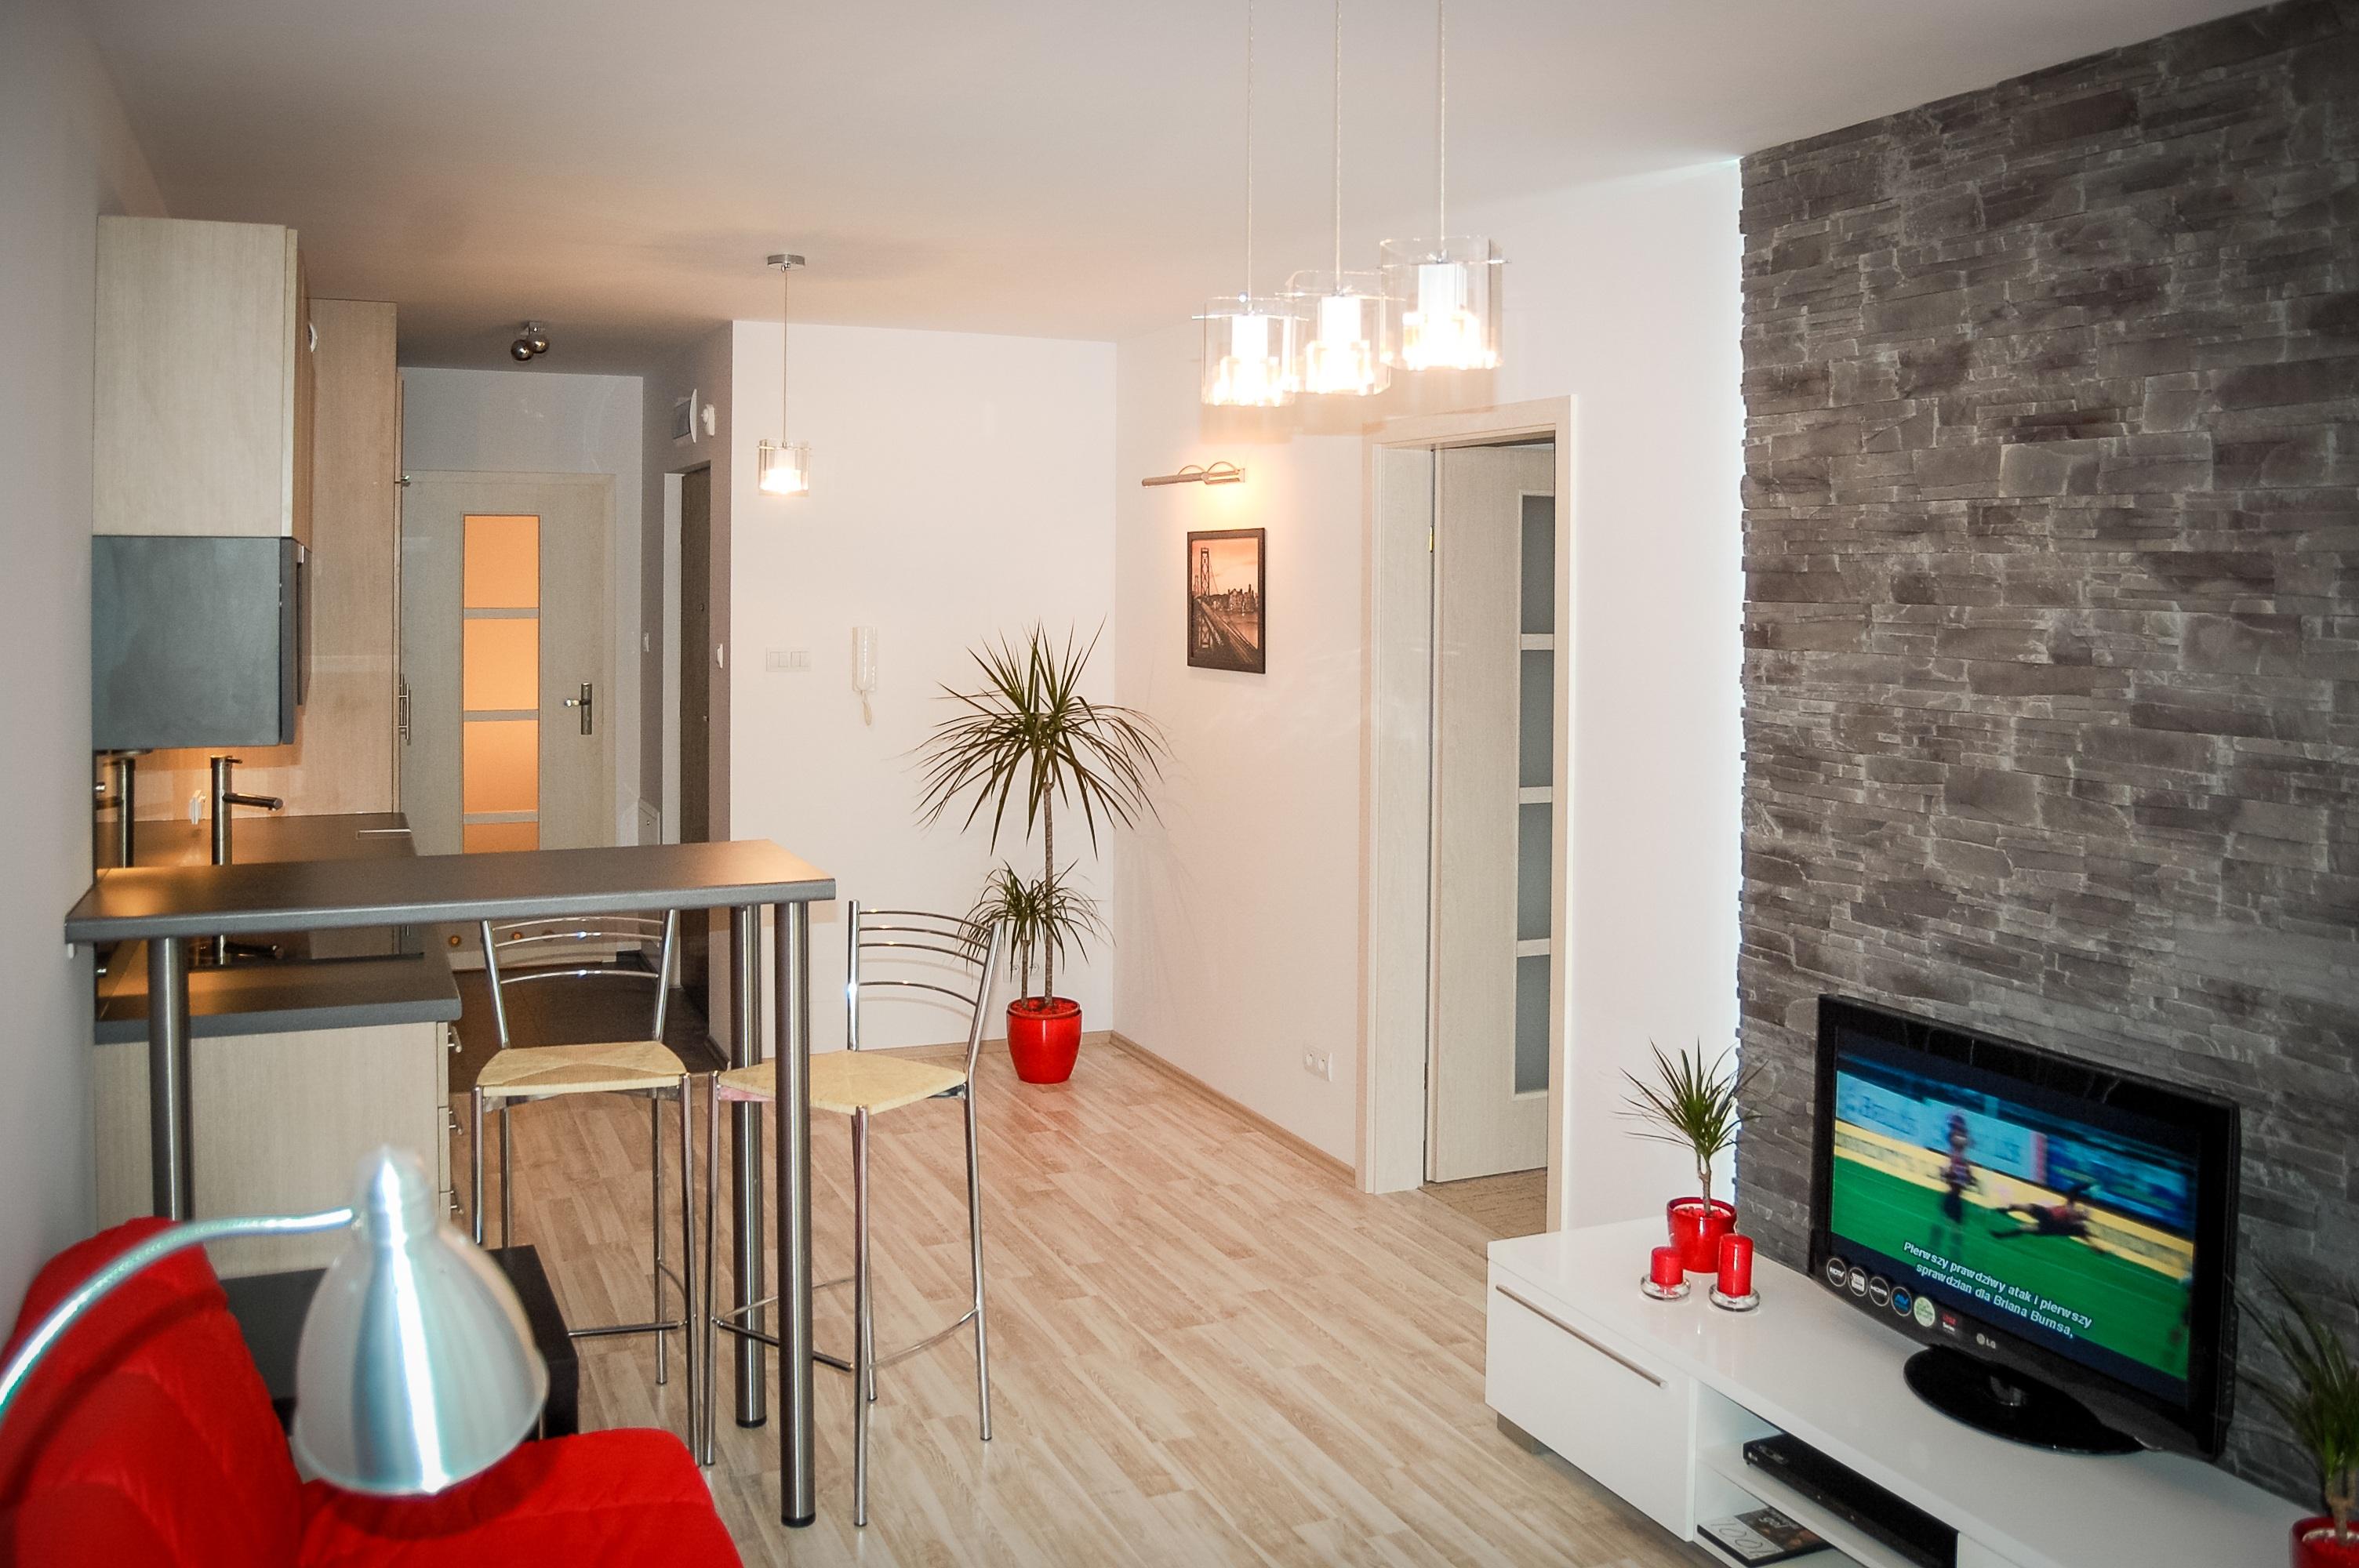 Free Images : architecture, floor, home, cottage, loft, kitchen ...